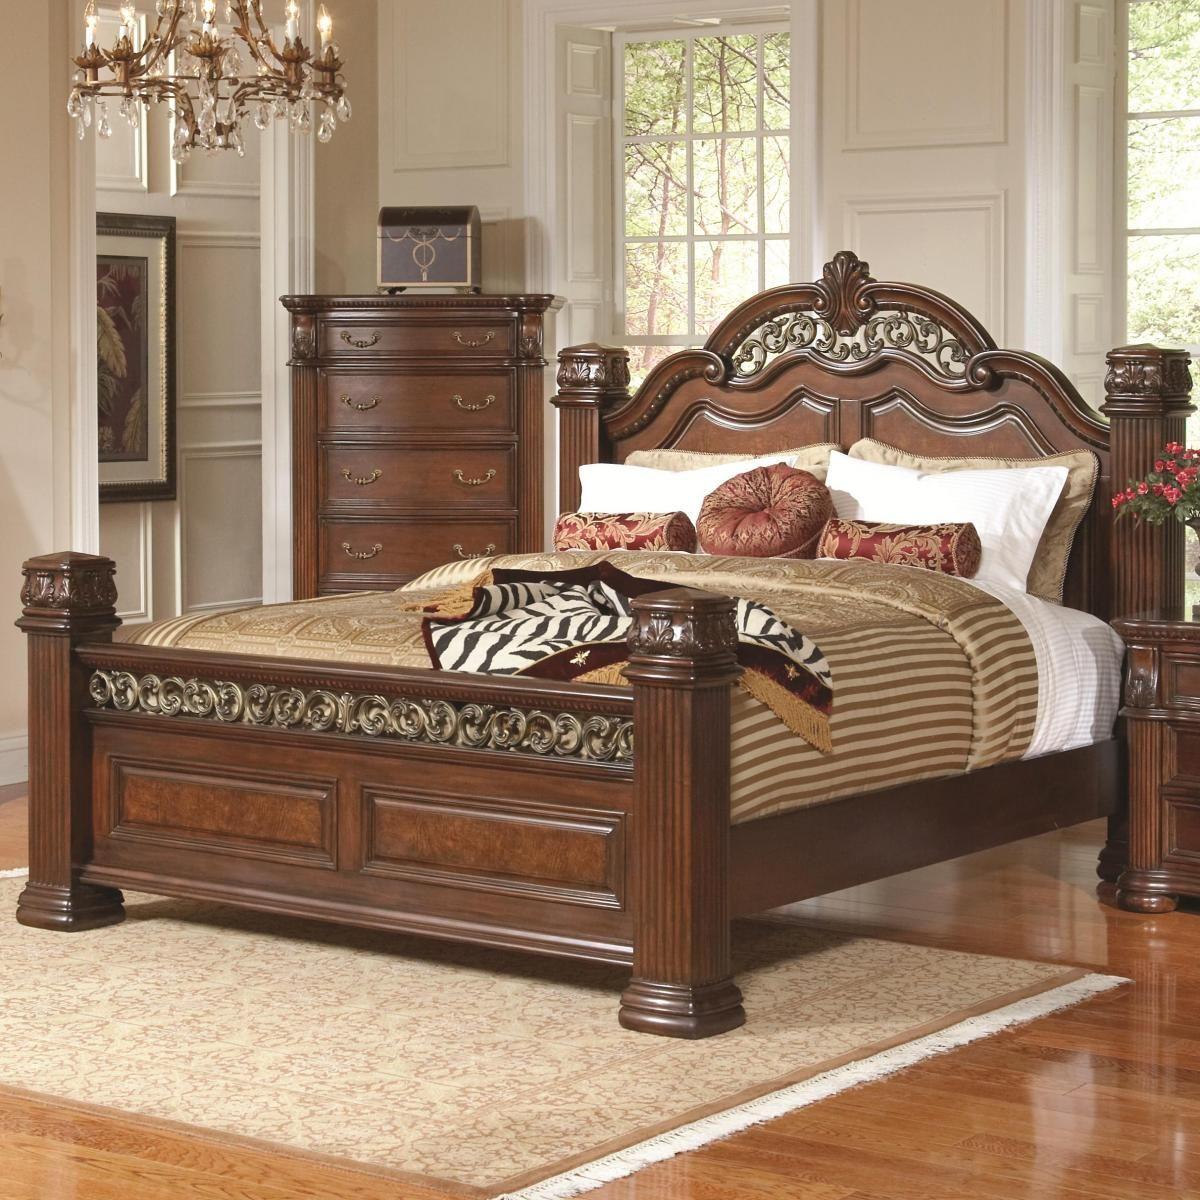 Bedroom Furniture Designs Pictures Wooden King Size Bed Bedroom Furniture Design Bedroom Bed Design